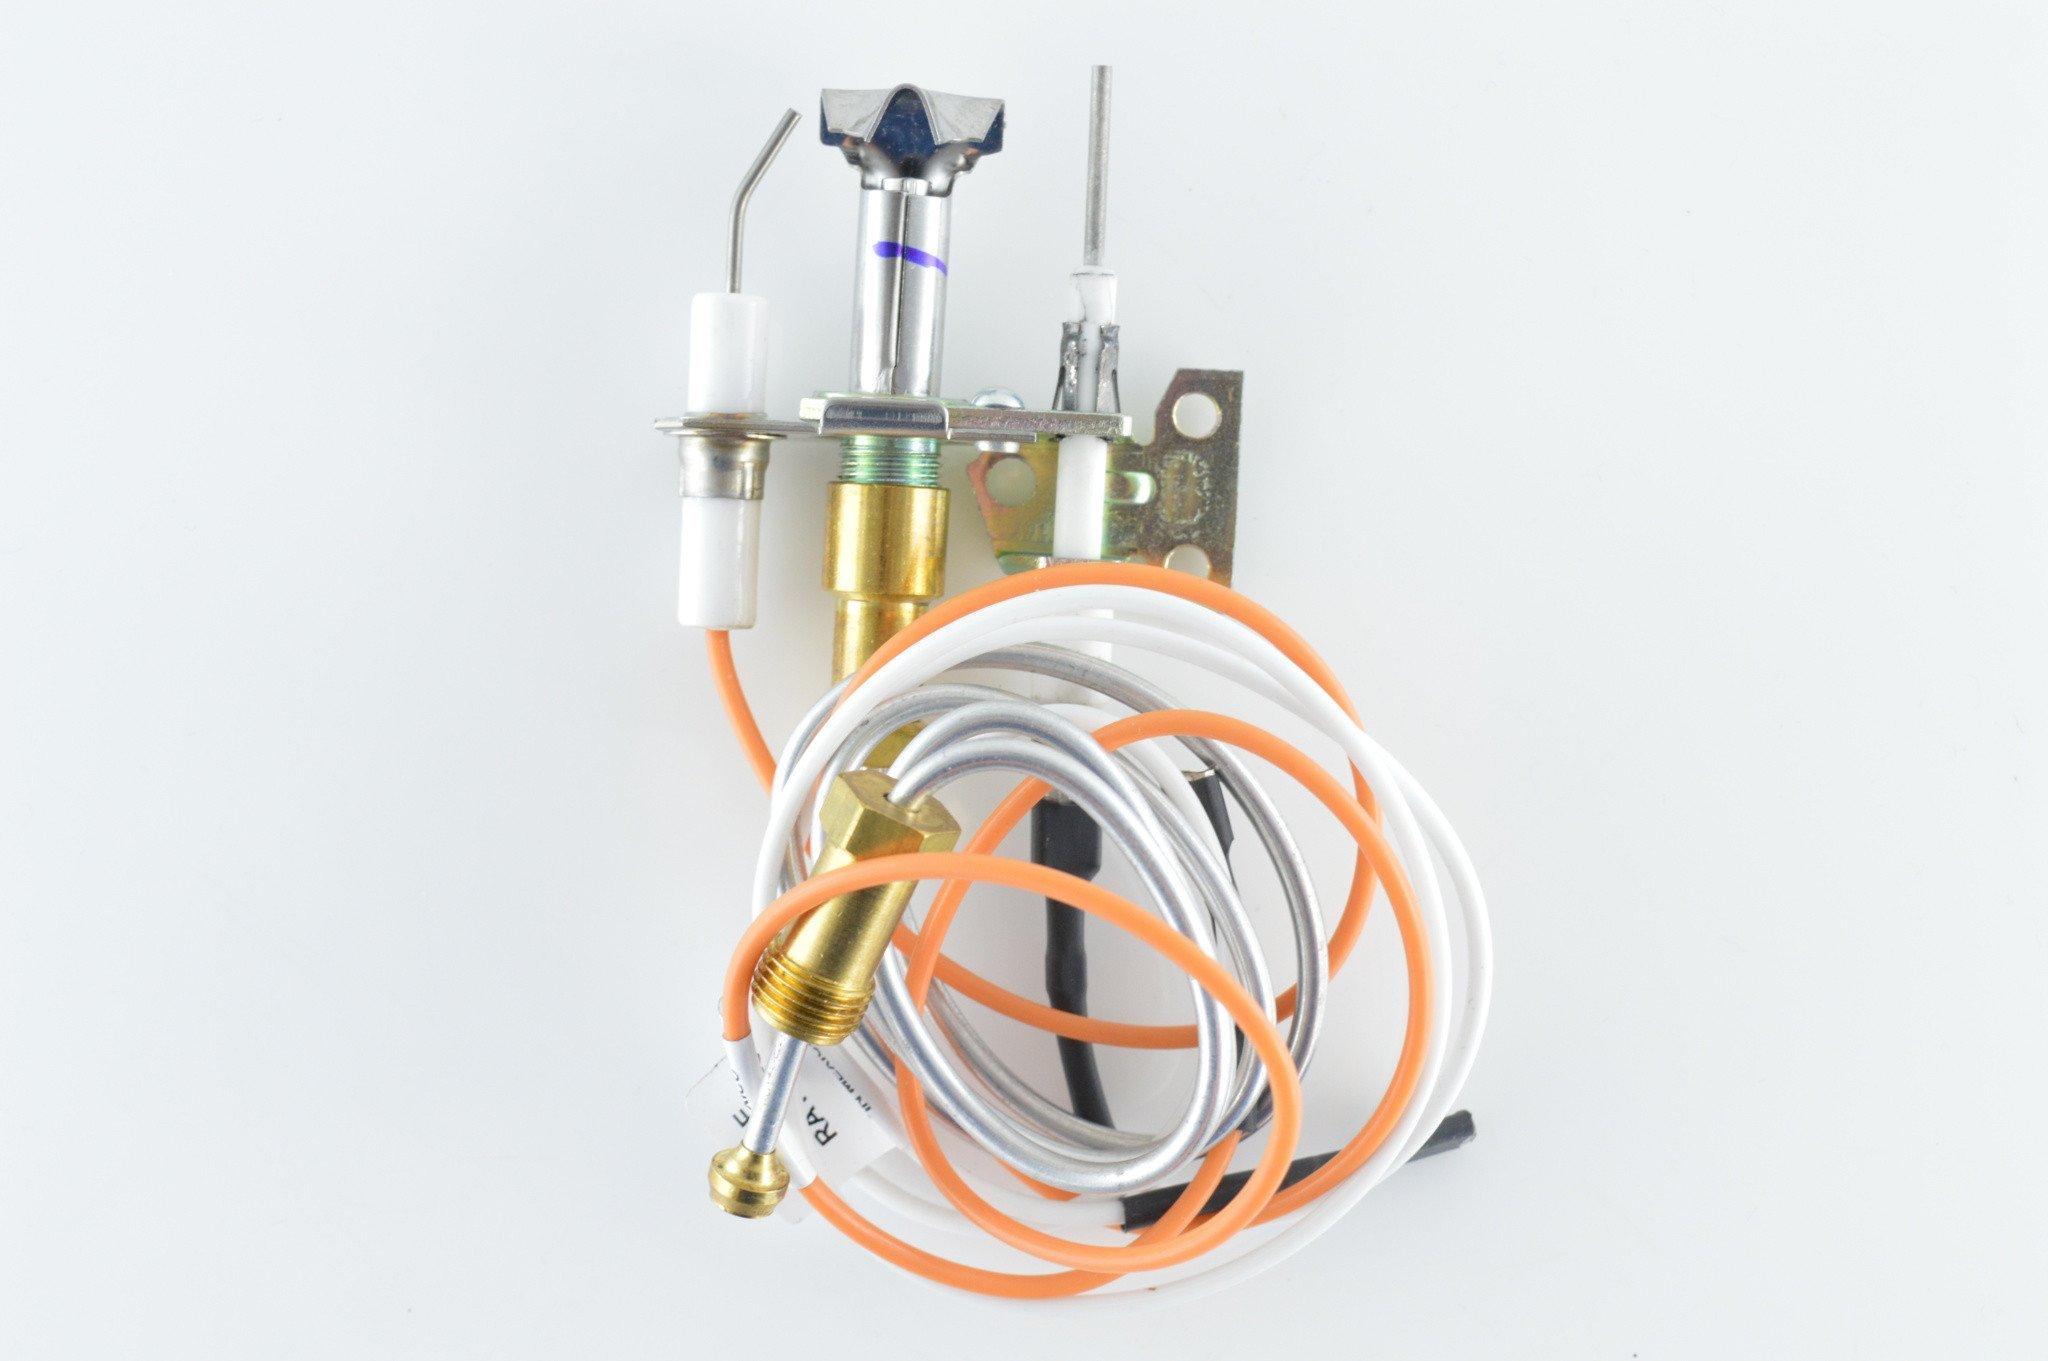 Heatilator Heat-n-glo IPI Natural Gas Pilot Assembly 4021-730 by Heatilator